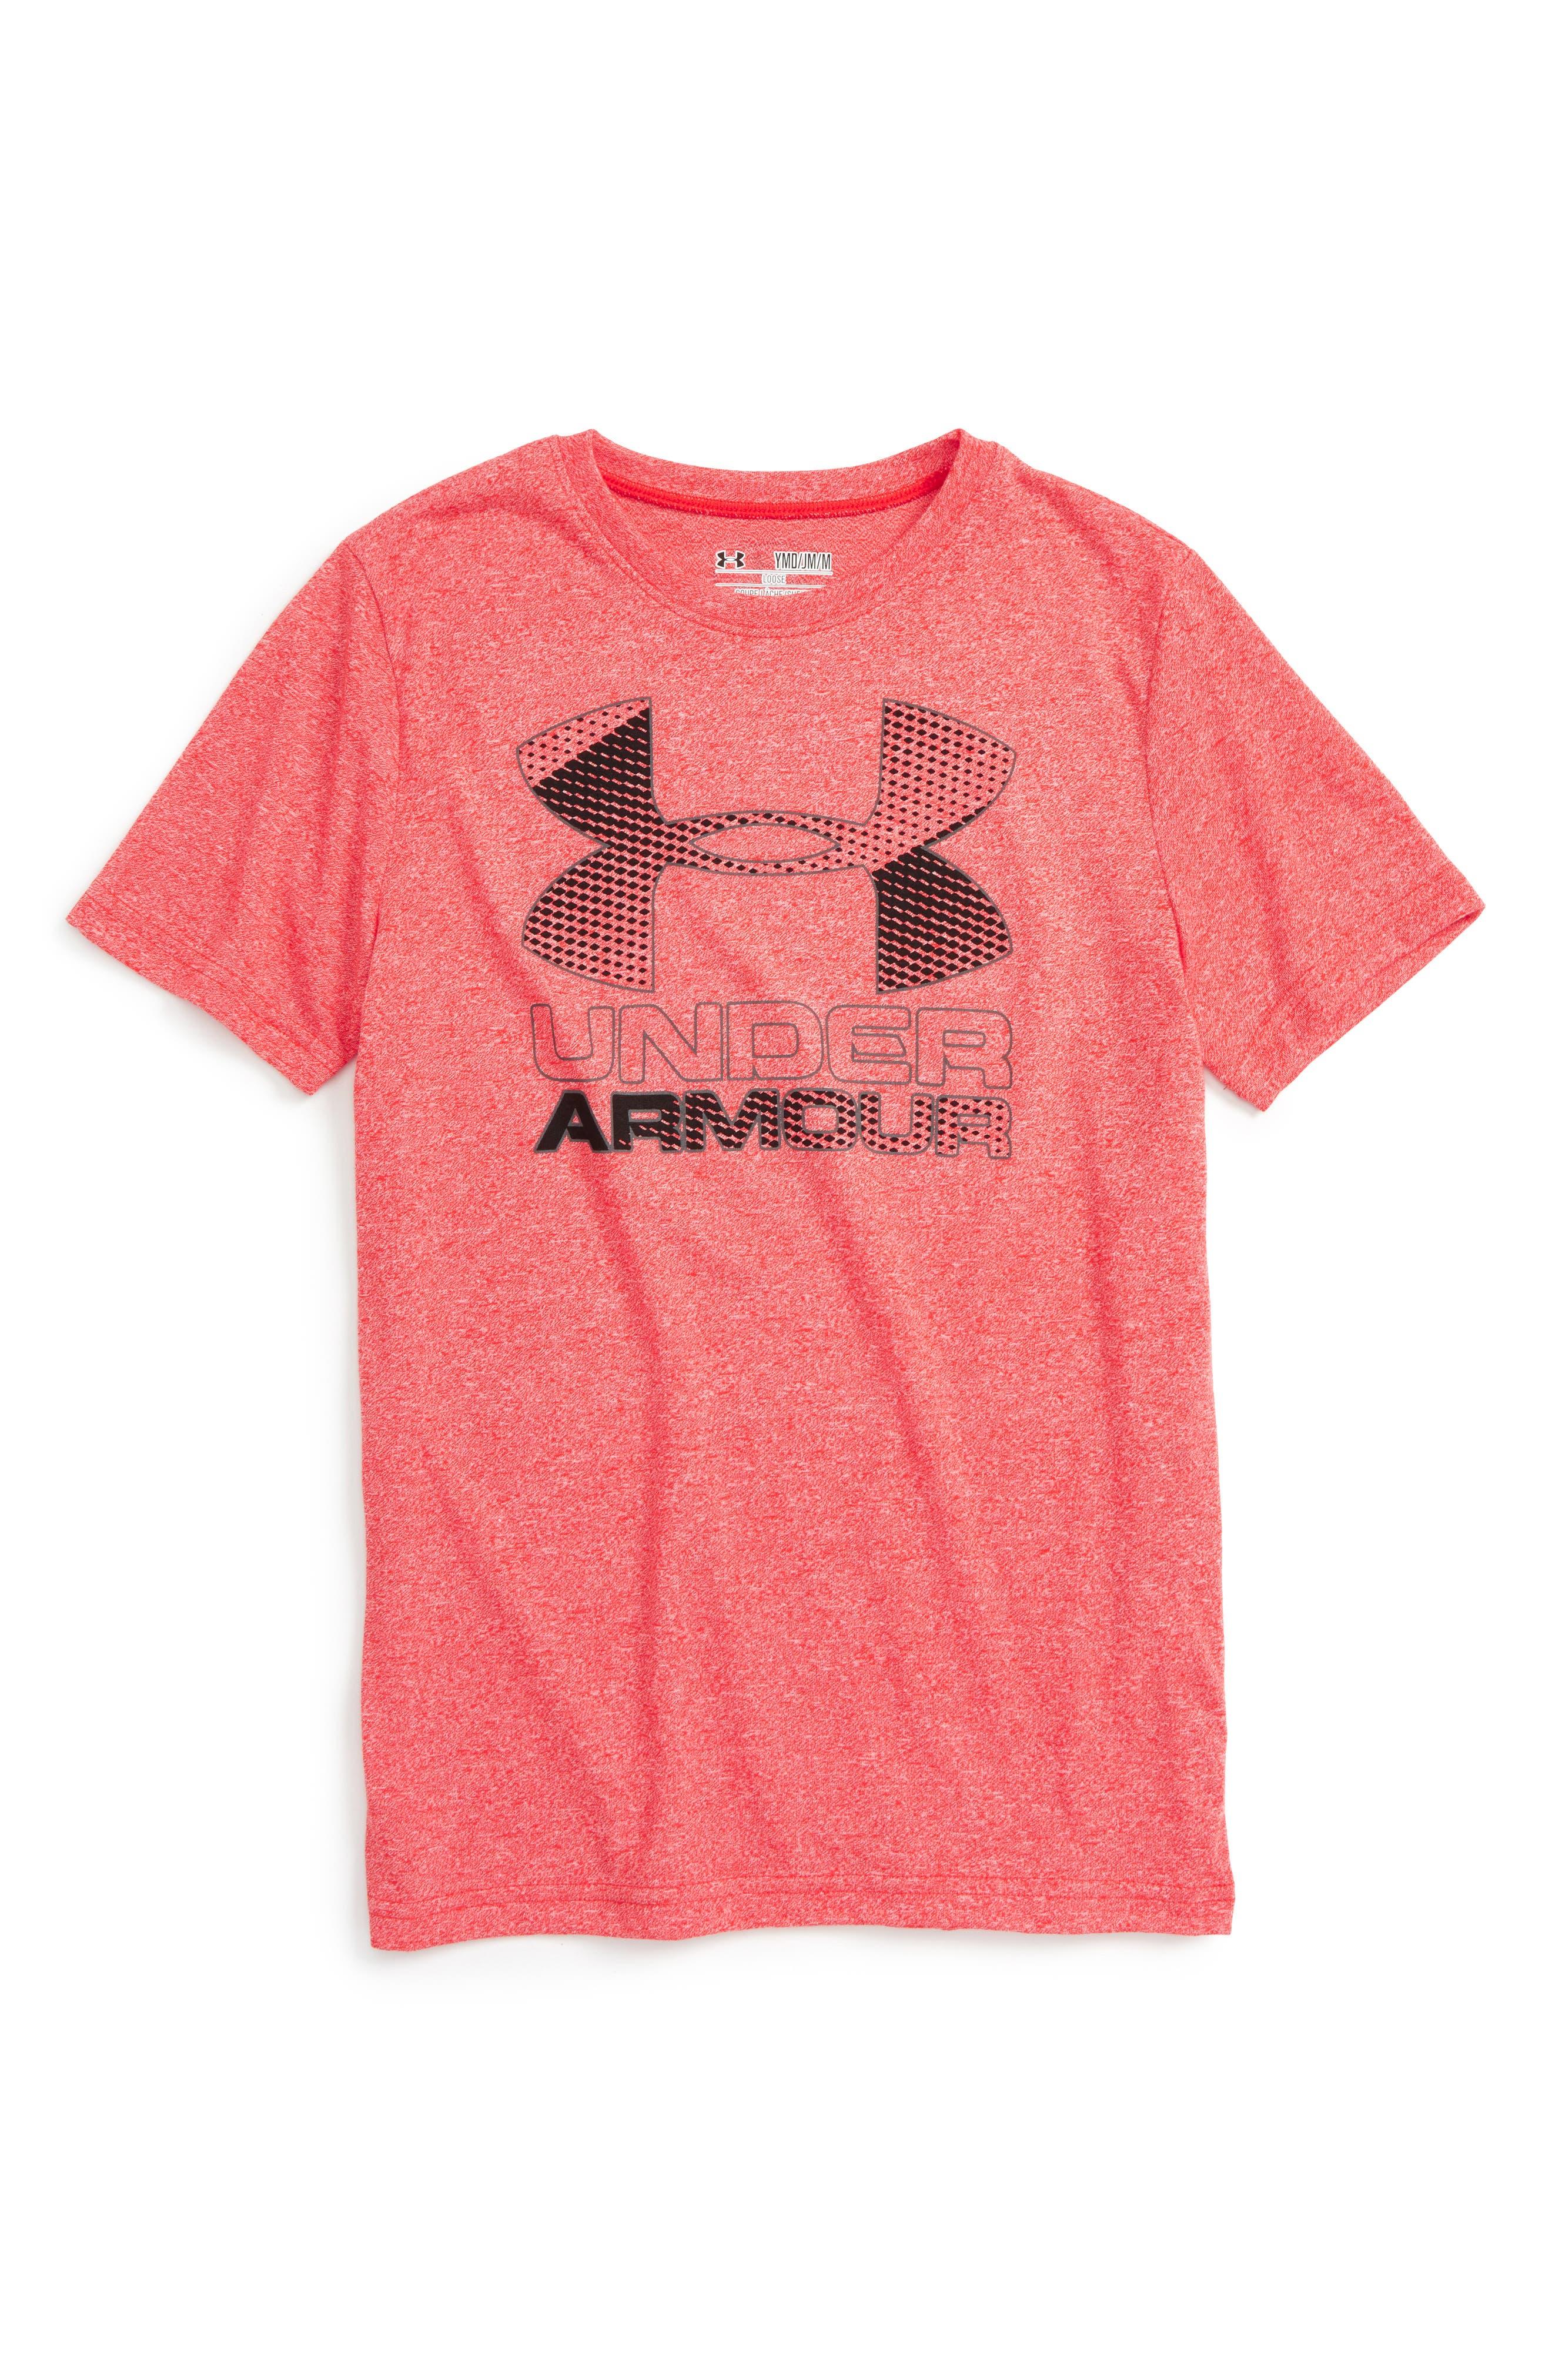 Alternate Image 1 Selected - Under Armour Big Logo Hybrid 2.0 HeatGear® T-Shirt (Little Boys & Big Boys)